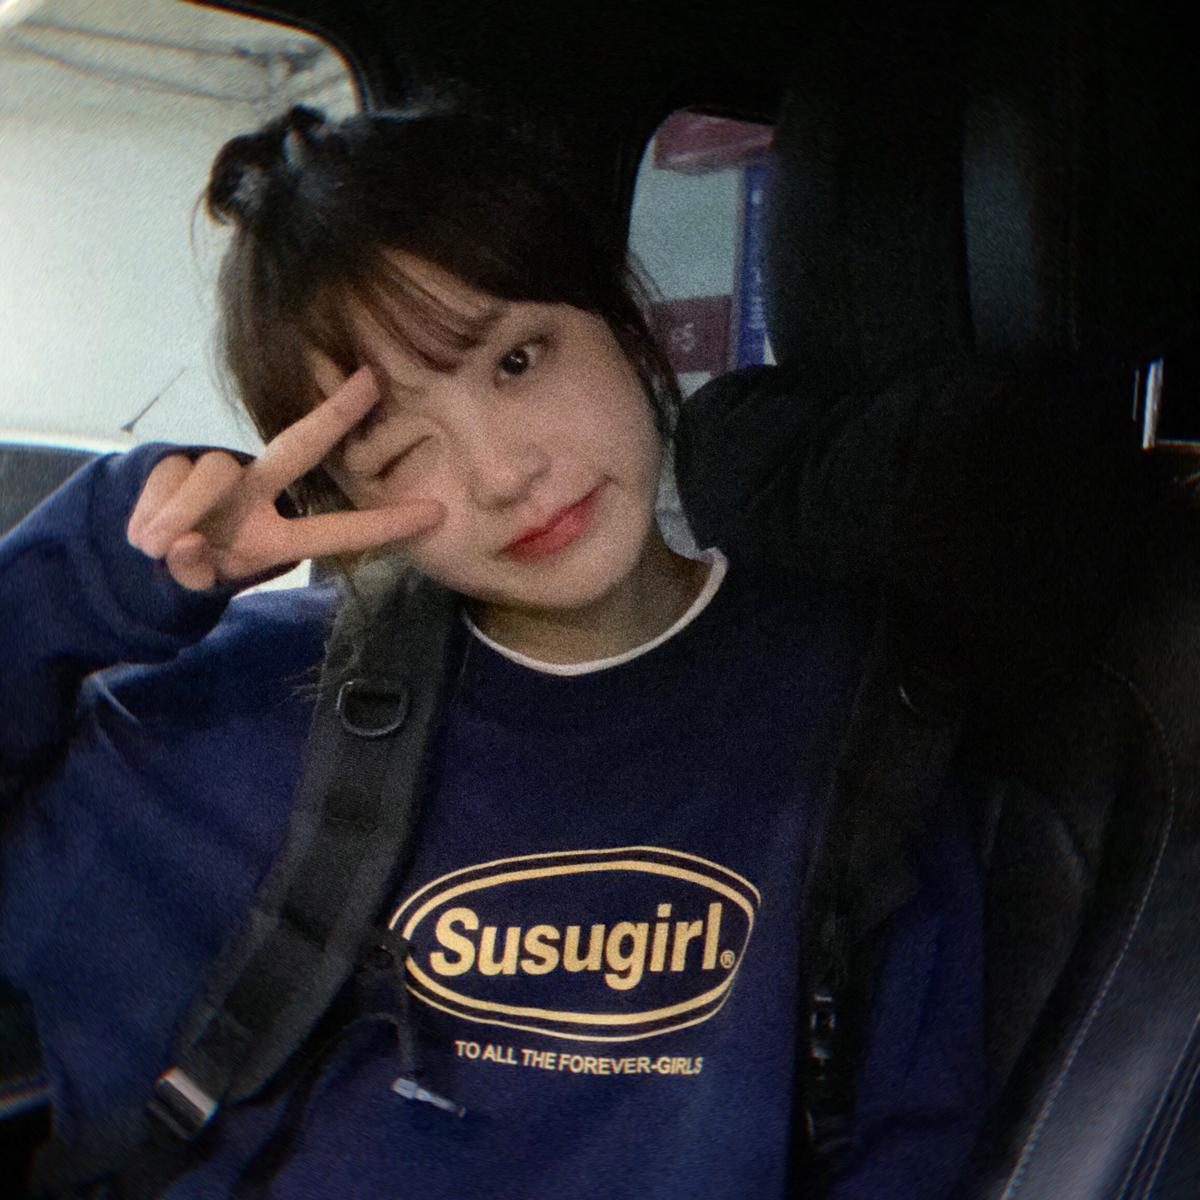 SUSUGIRL原创 logo5色假两件潮休闲宽松显瘦圆领上衣卫衣韩女20秋